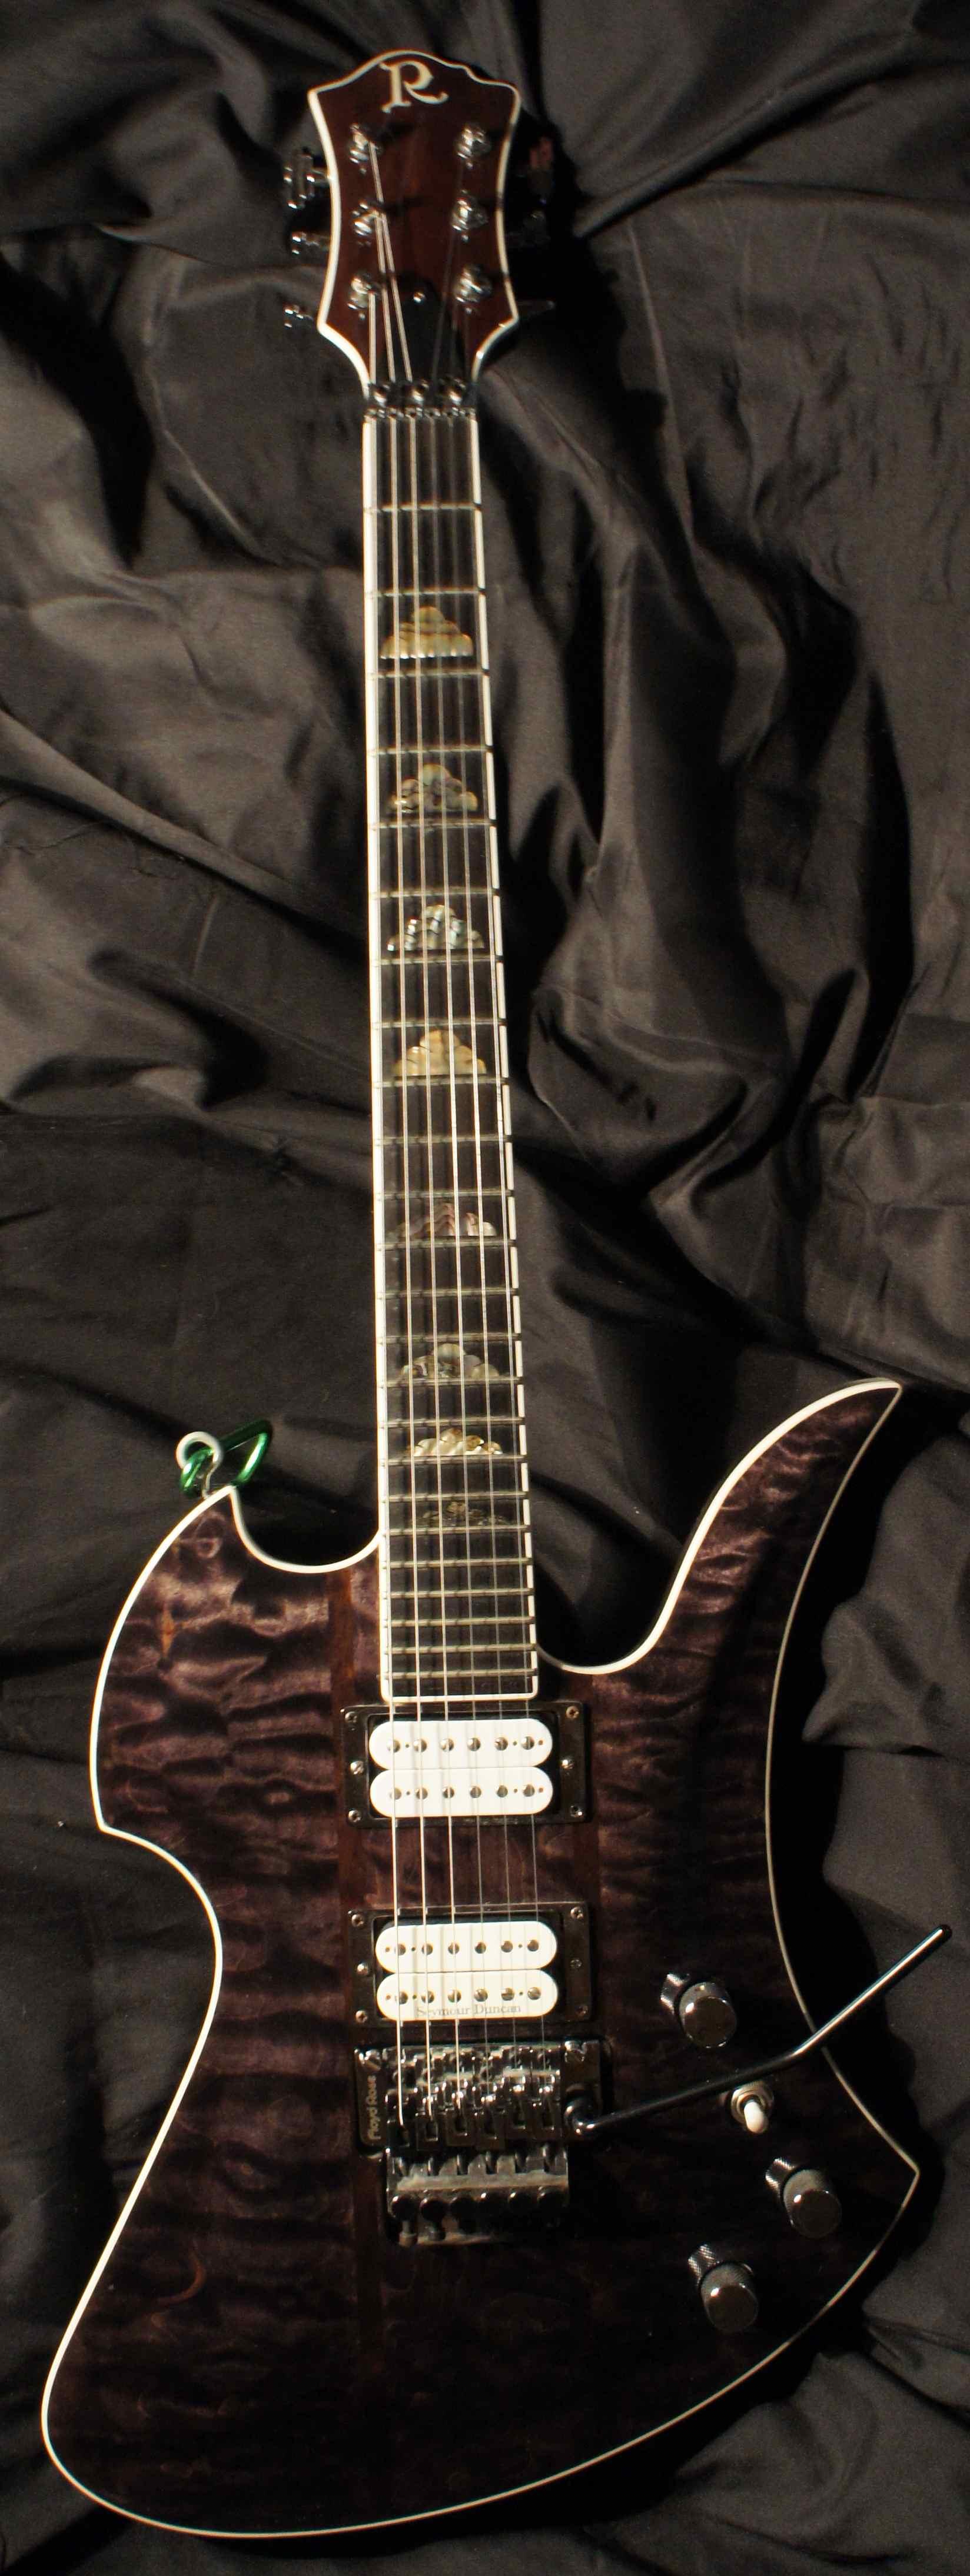 Dating B.C. Rich Guitar info (Guitarsite)